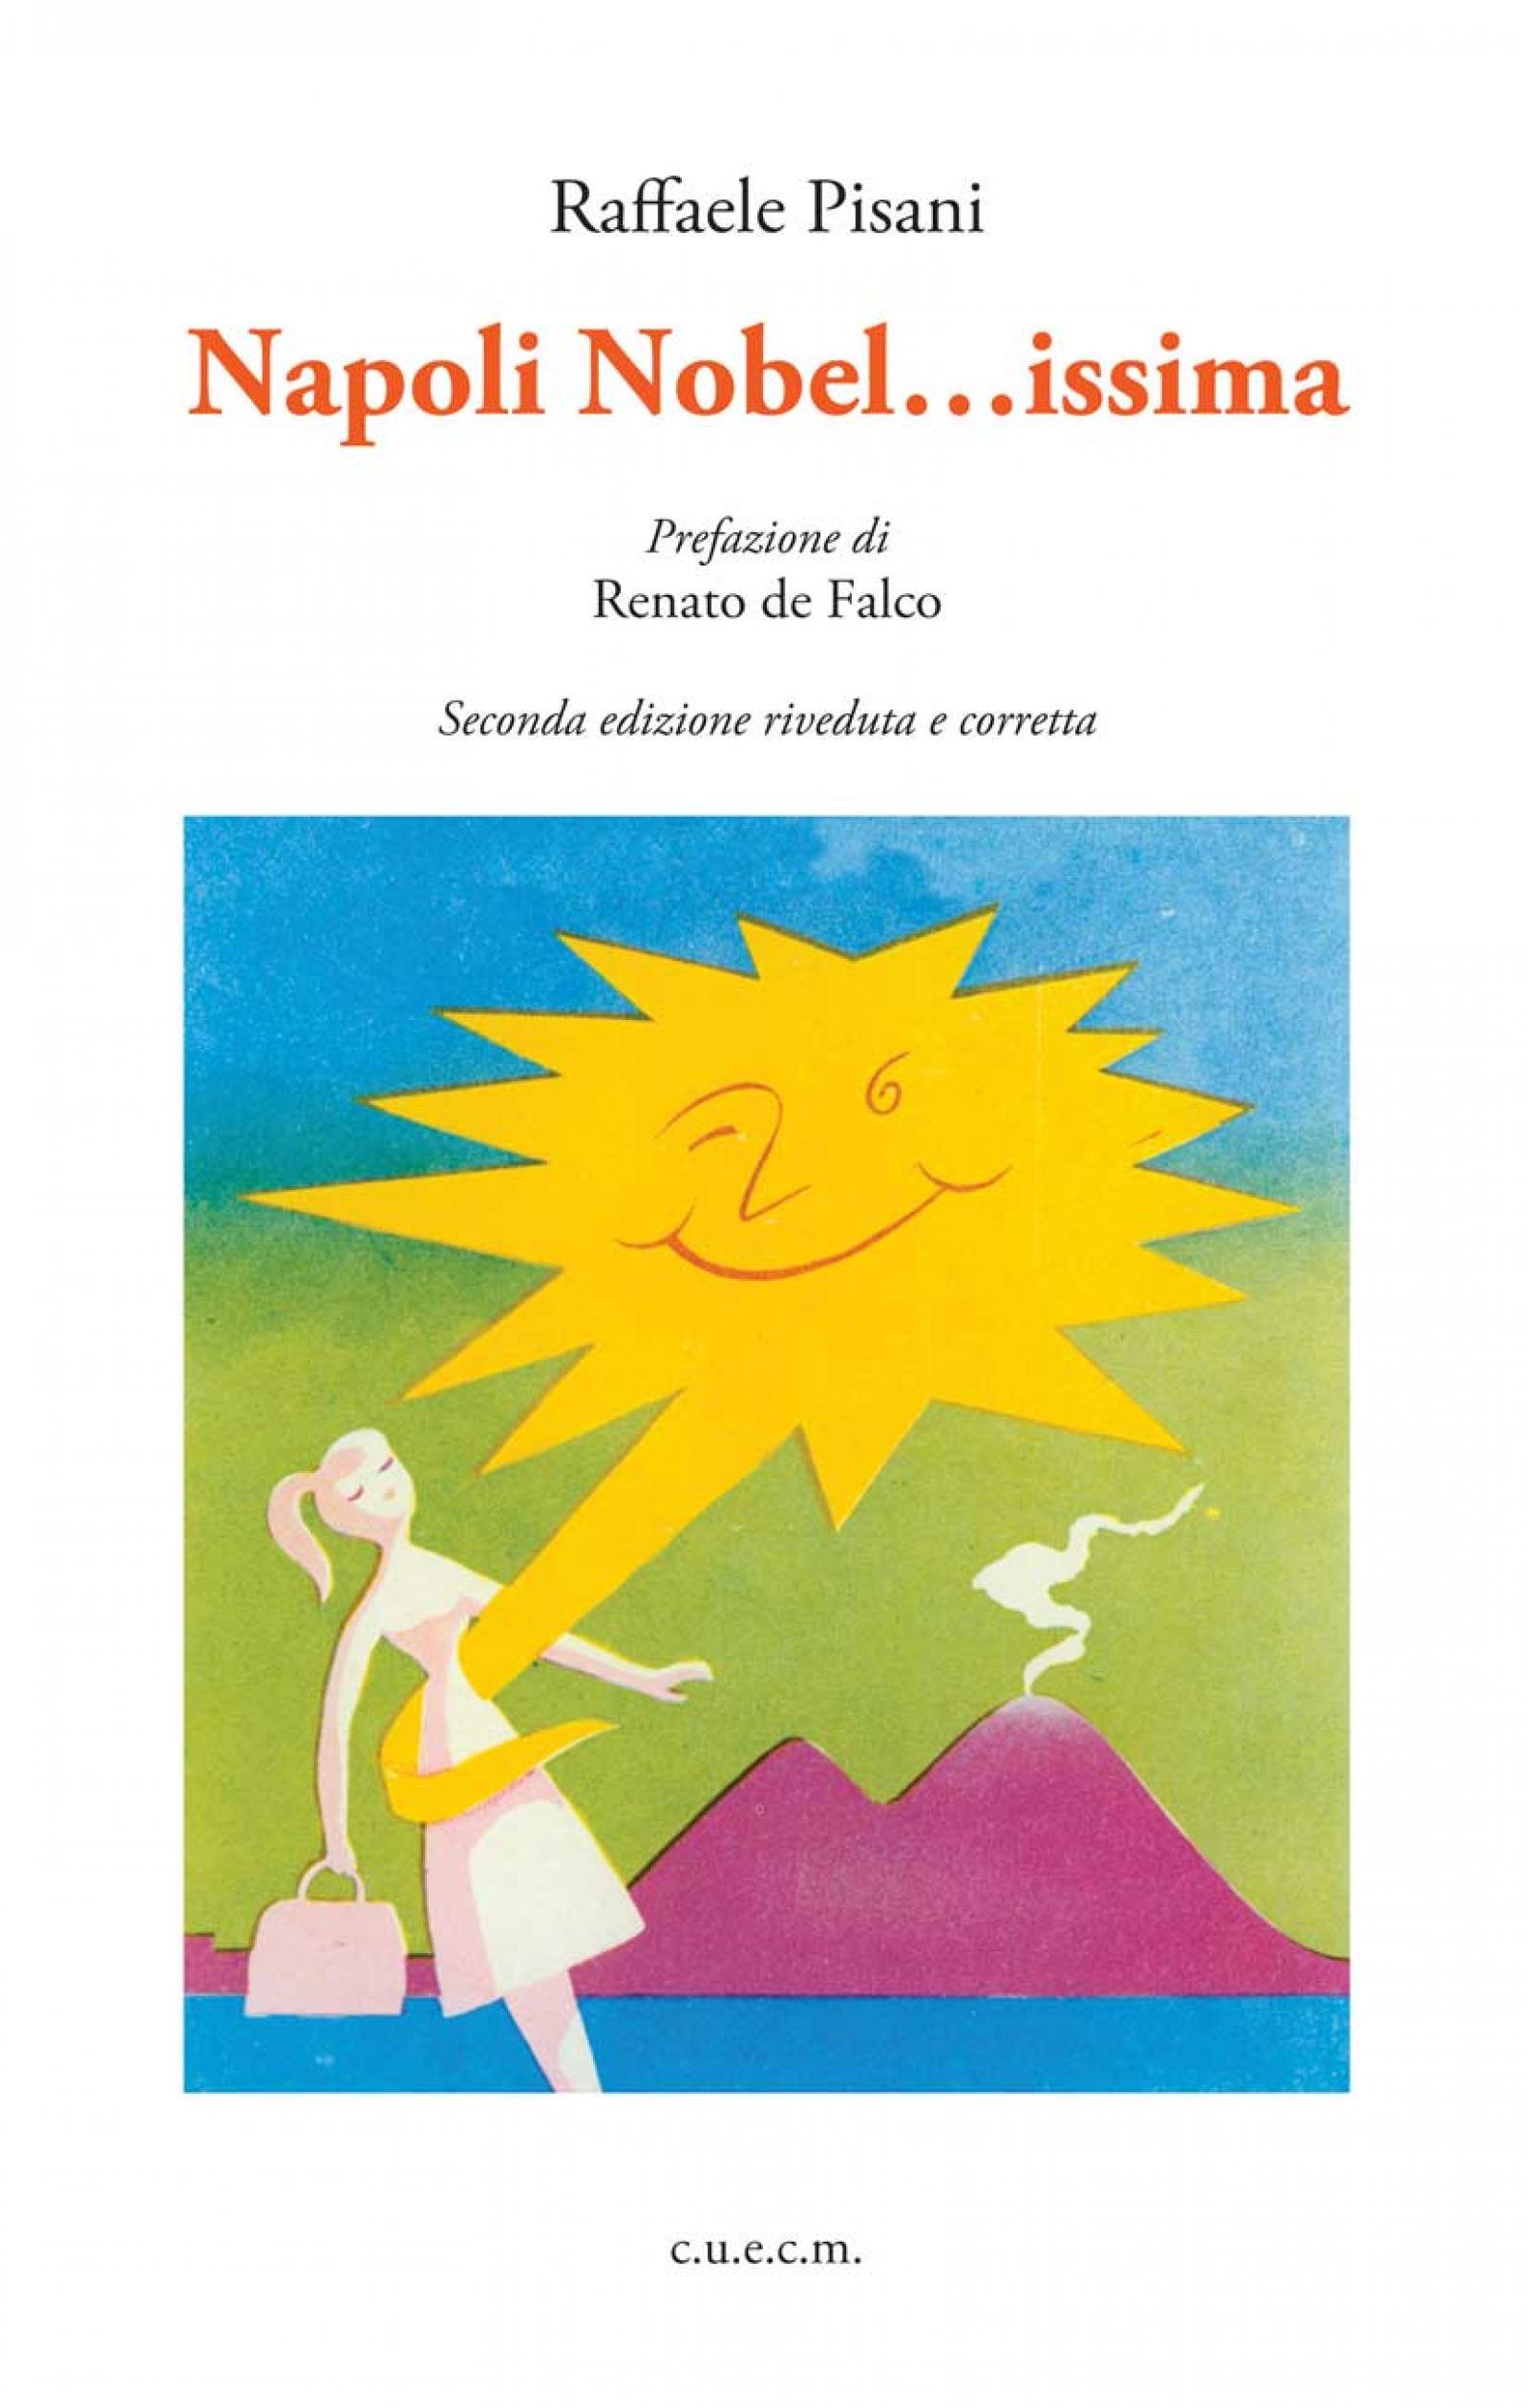 Napoli Nobel...issima